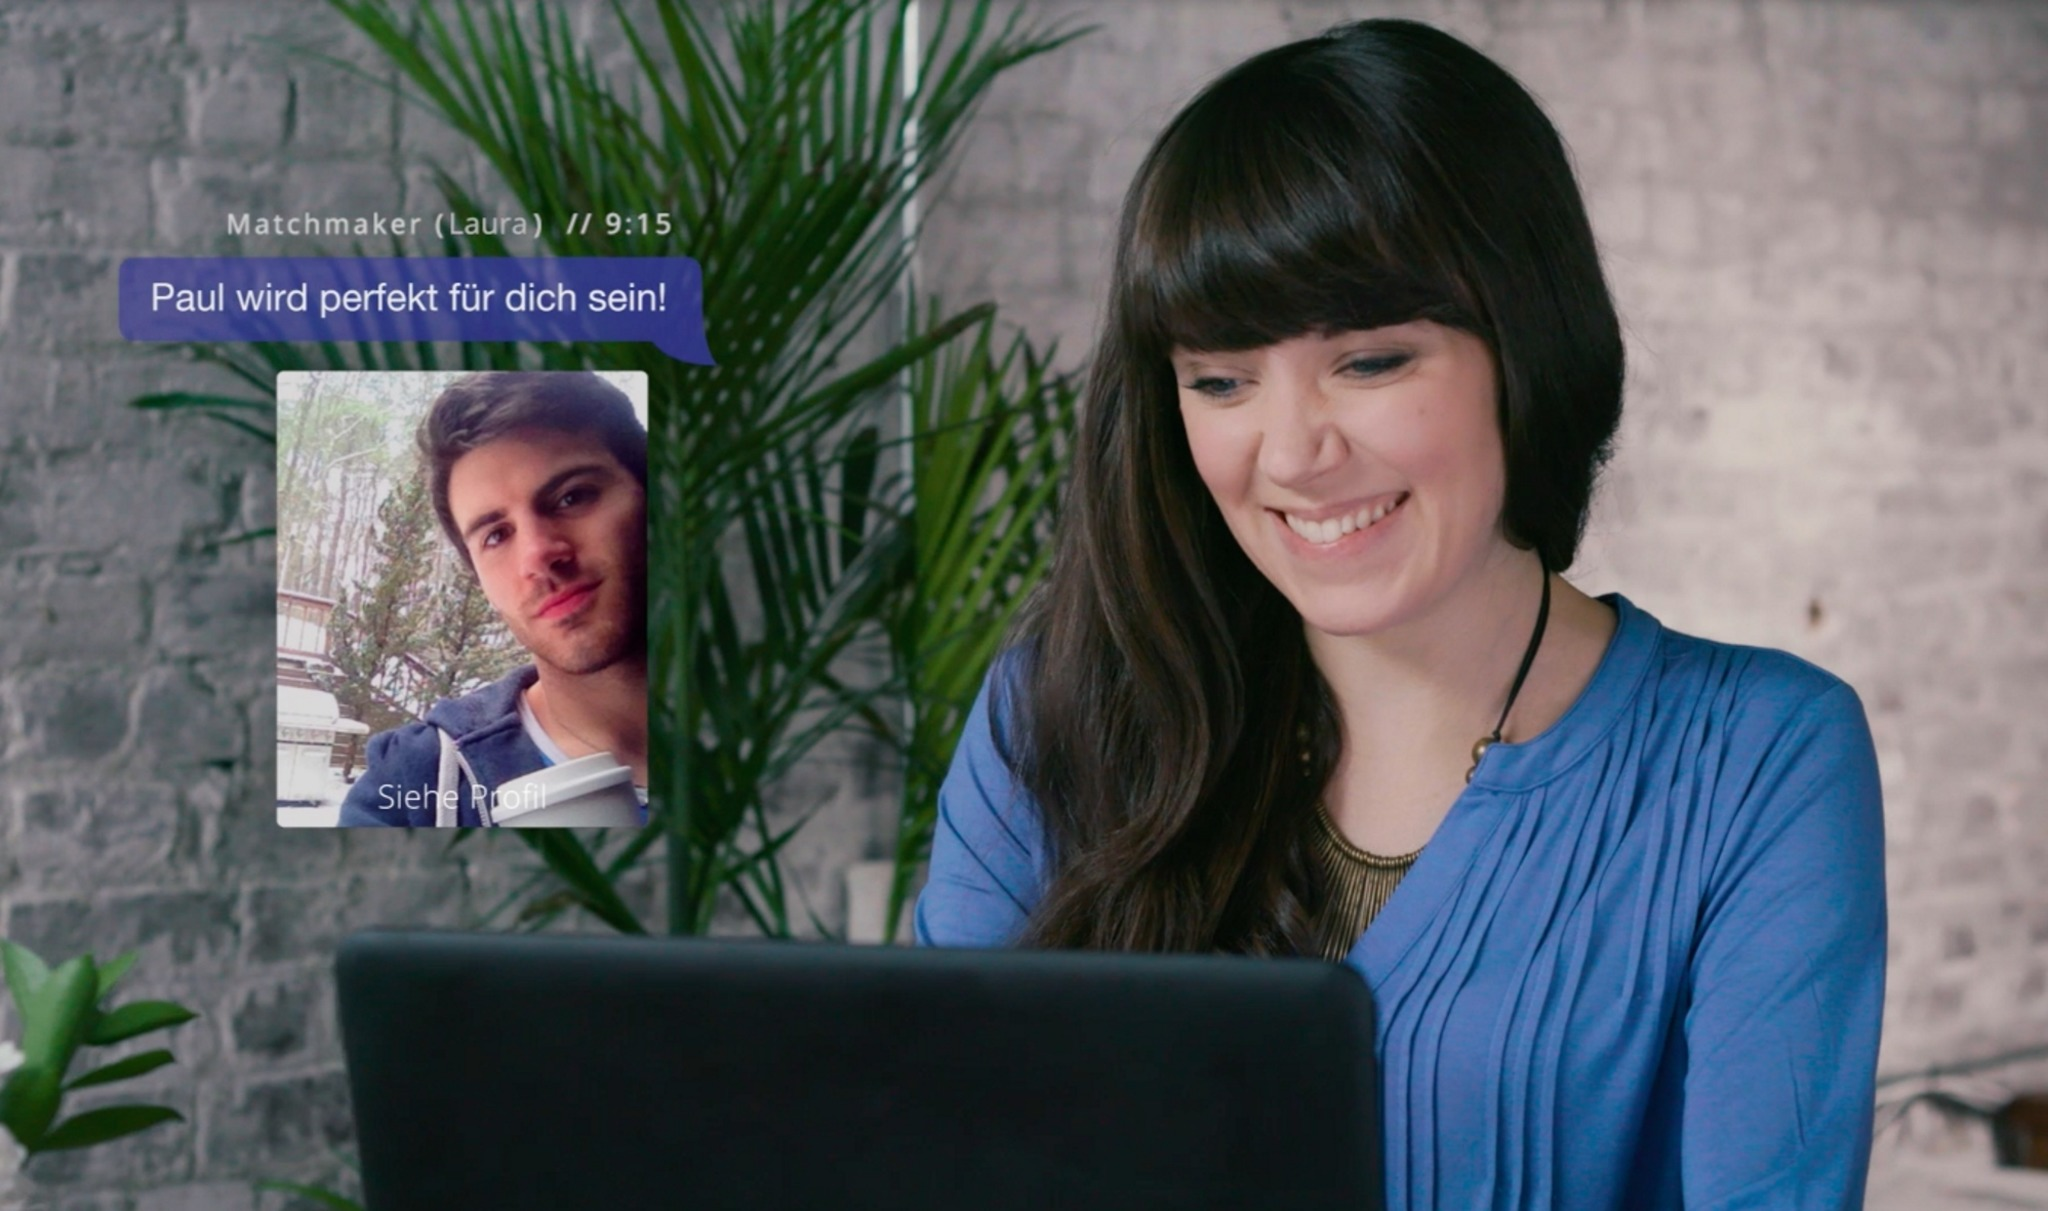 Acht Grnder aus N - Userrekord fr Dating-App - mysalenow.com